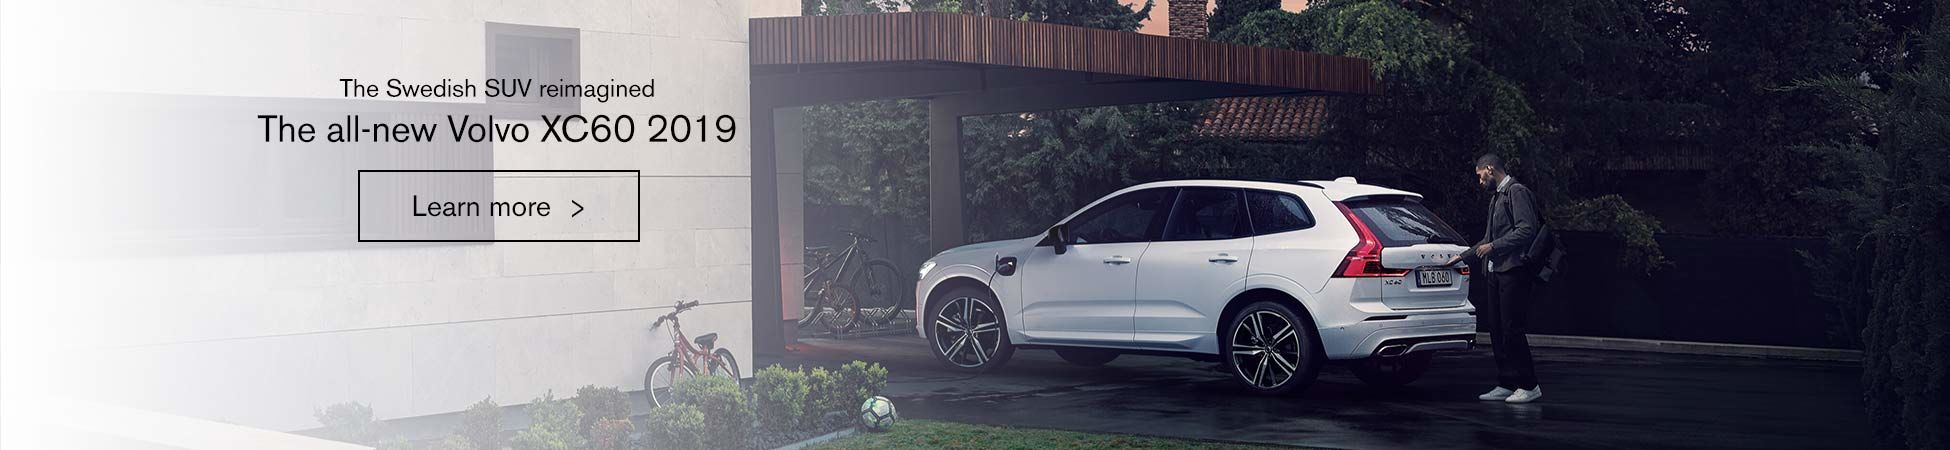 2019 Volvo Xc60 - Slideshow